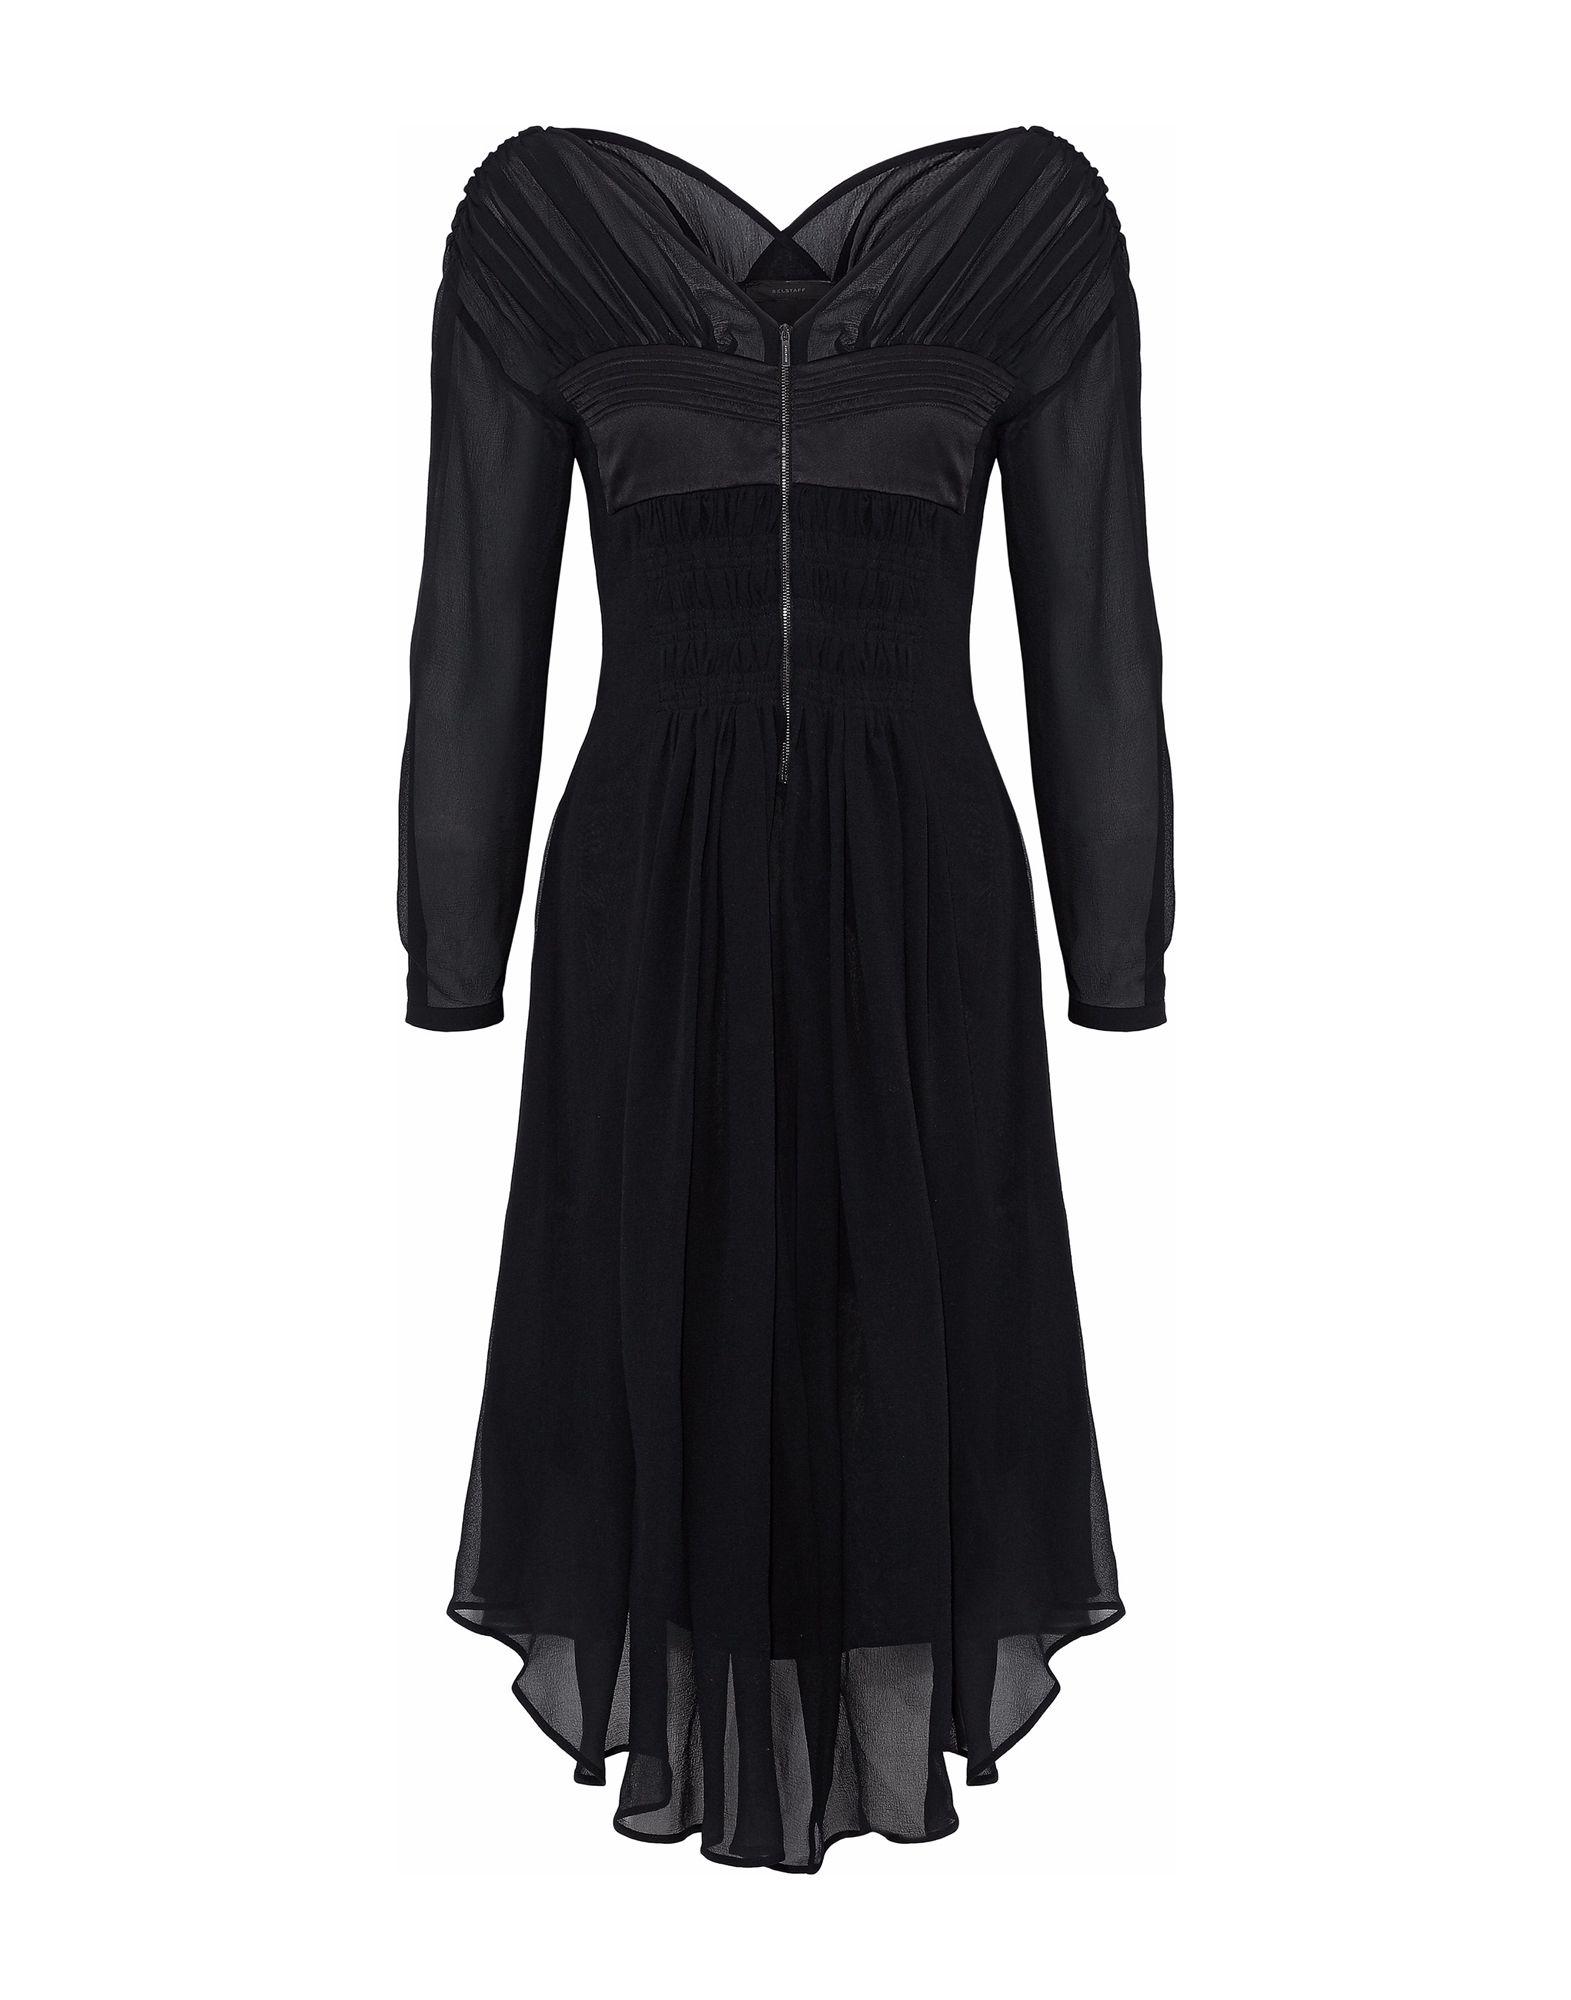 Belstaff Knee-length Dress In Black